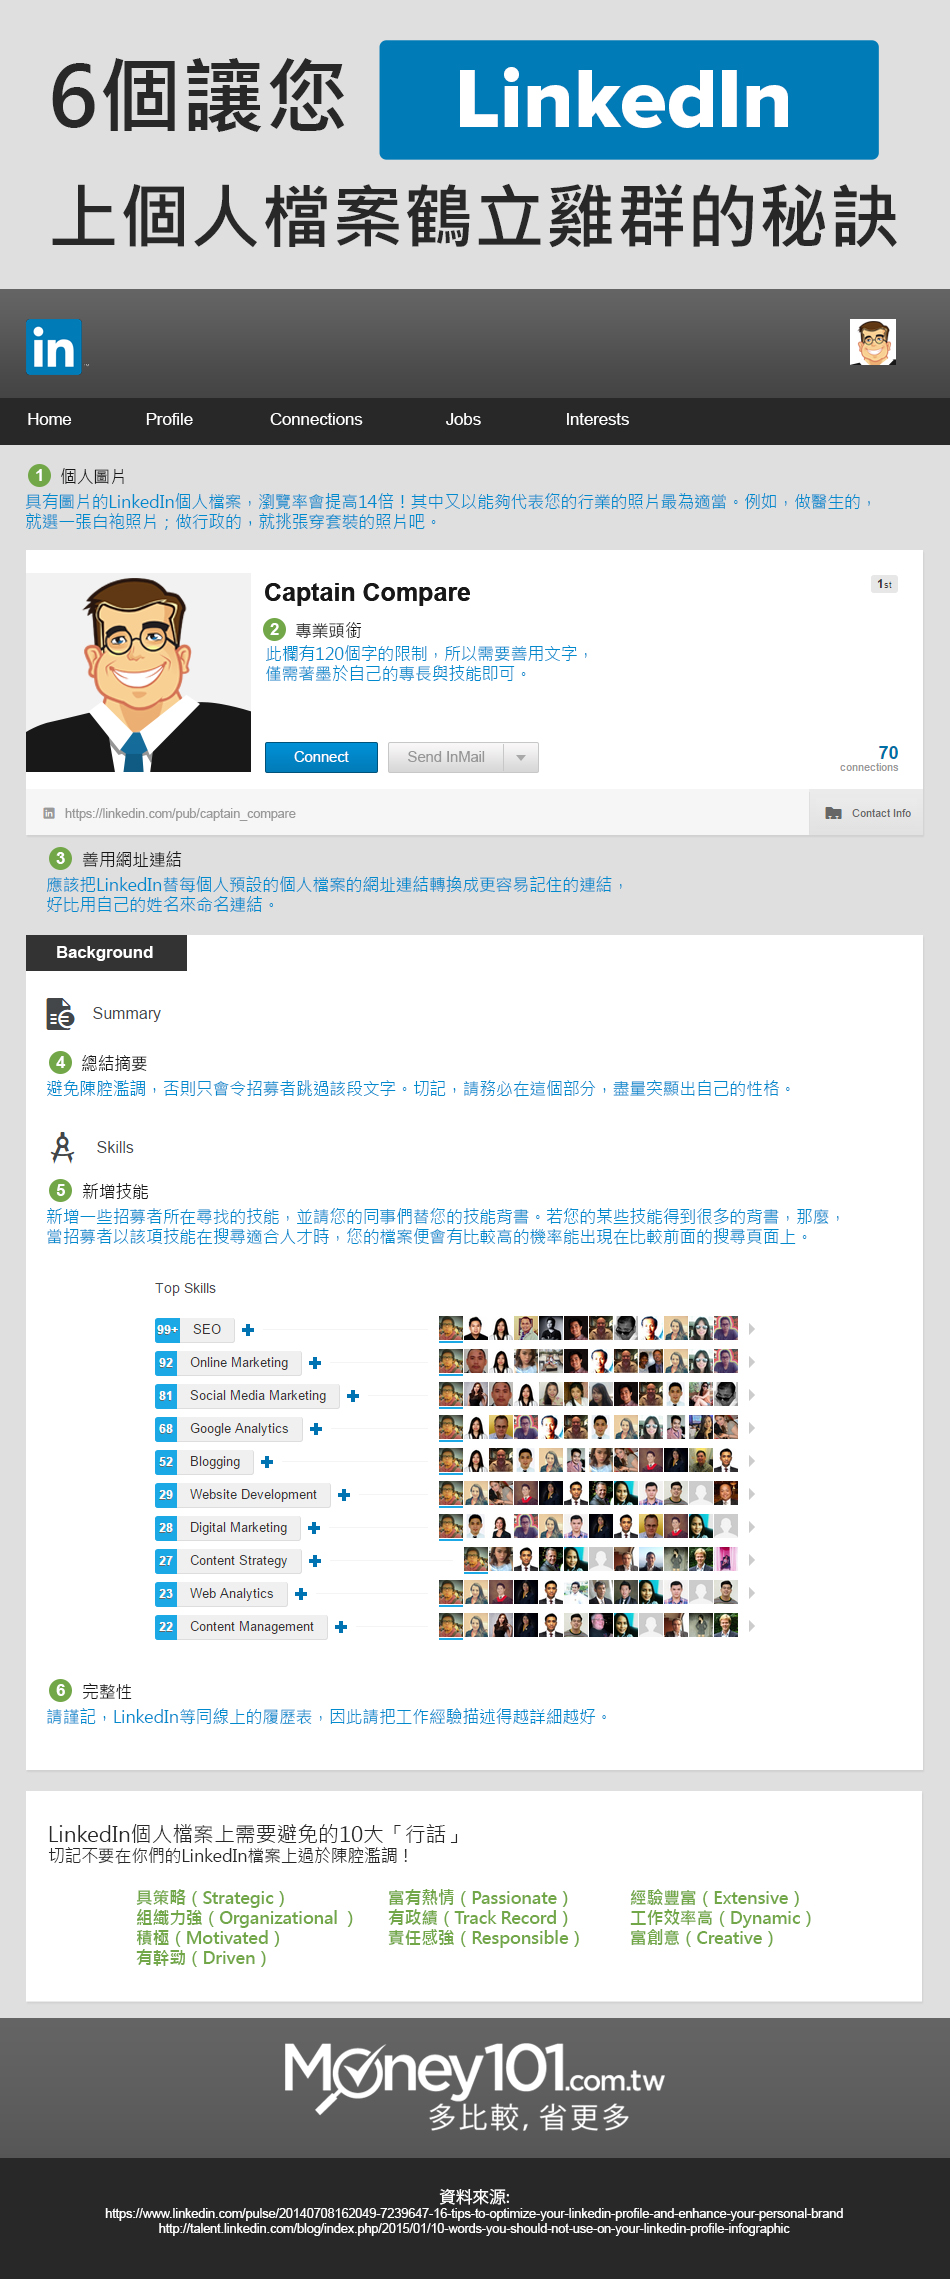 TW_IG_Optimizing_Linkedin_Profile - IG 內文